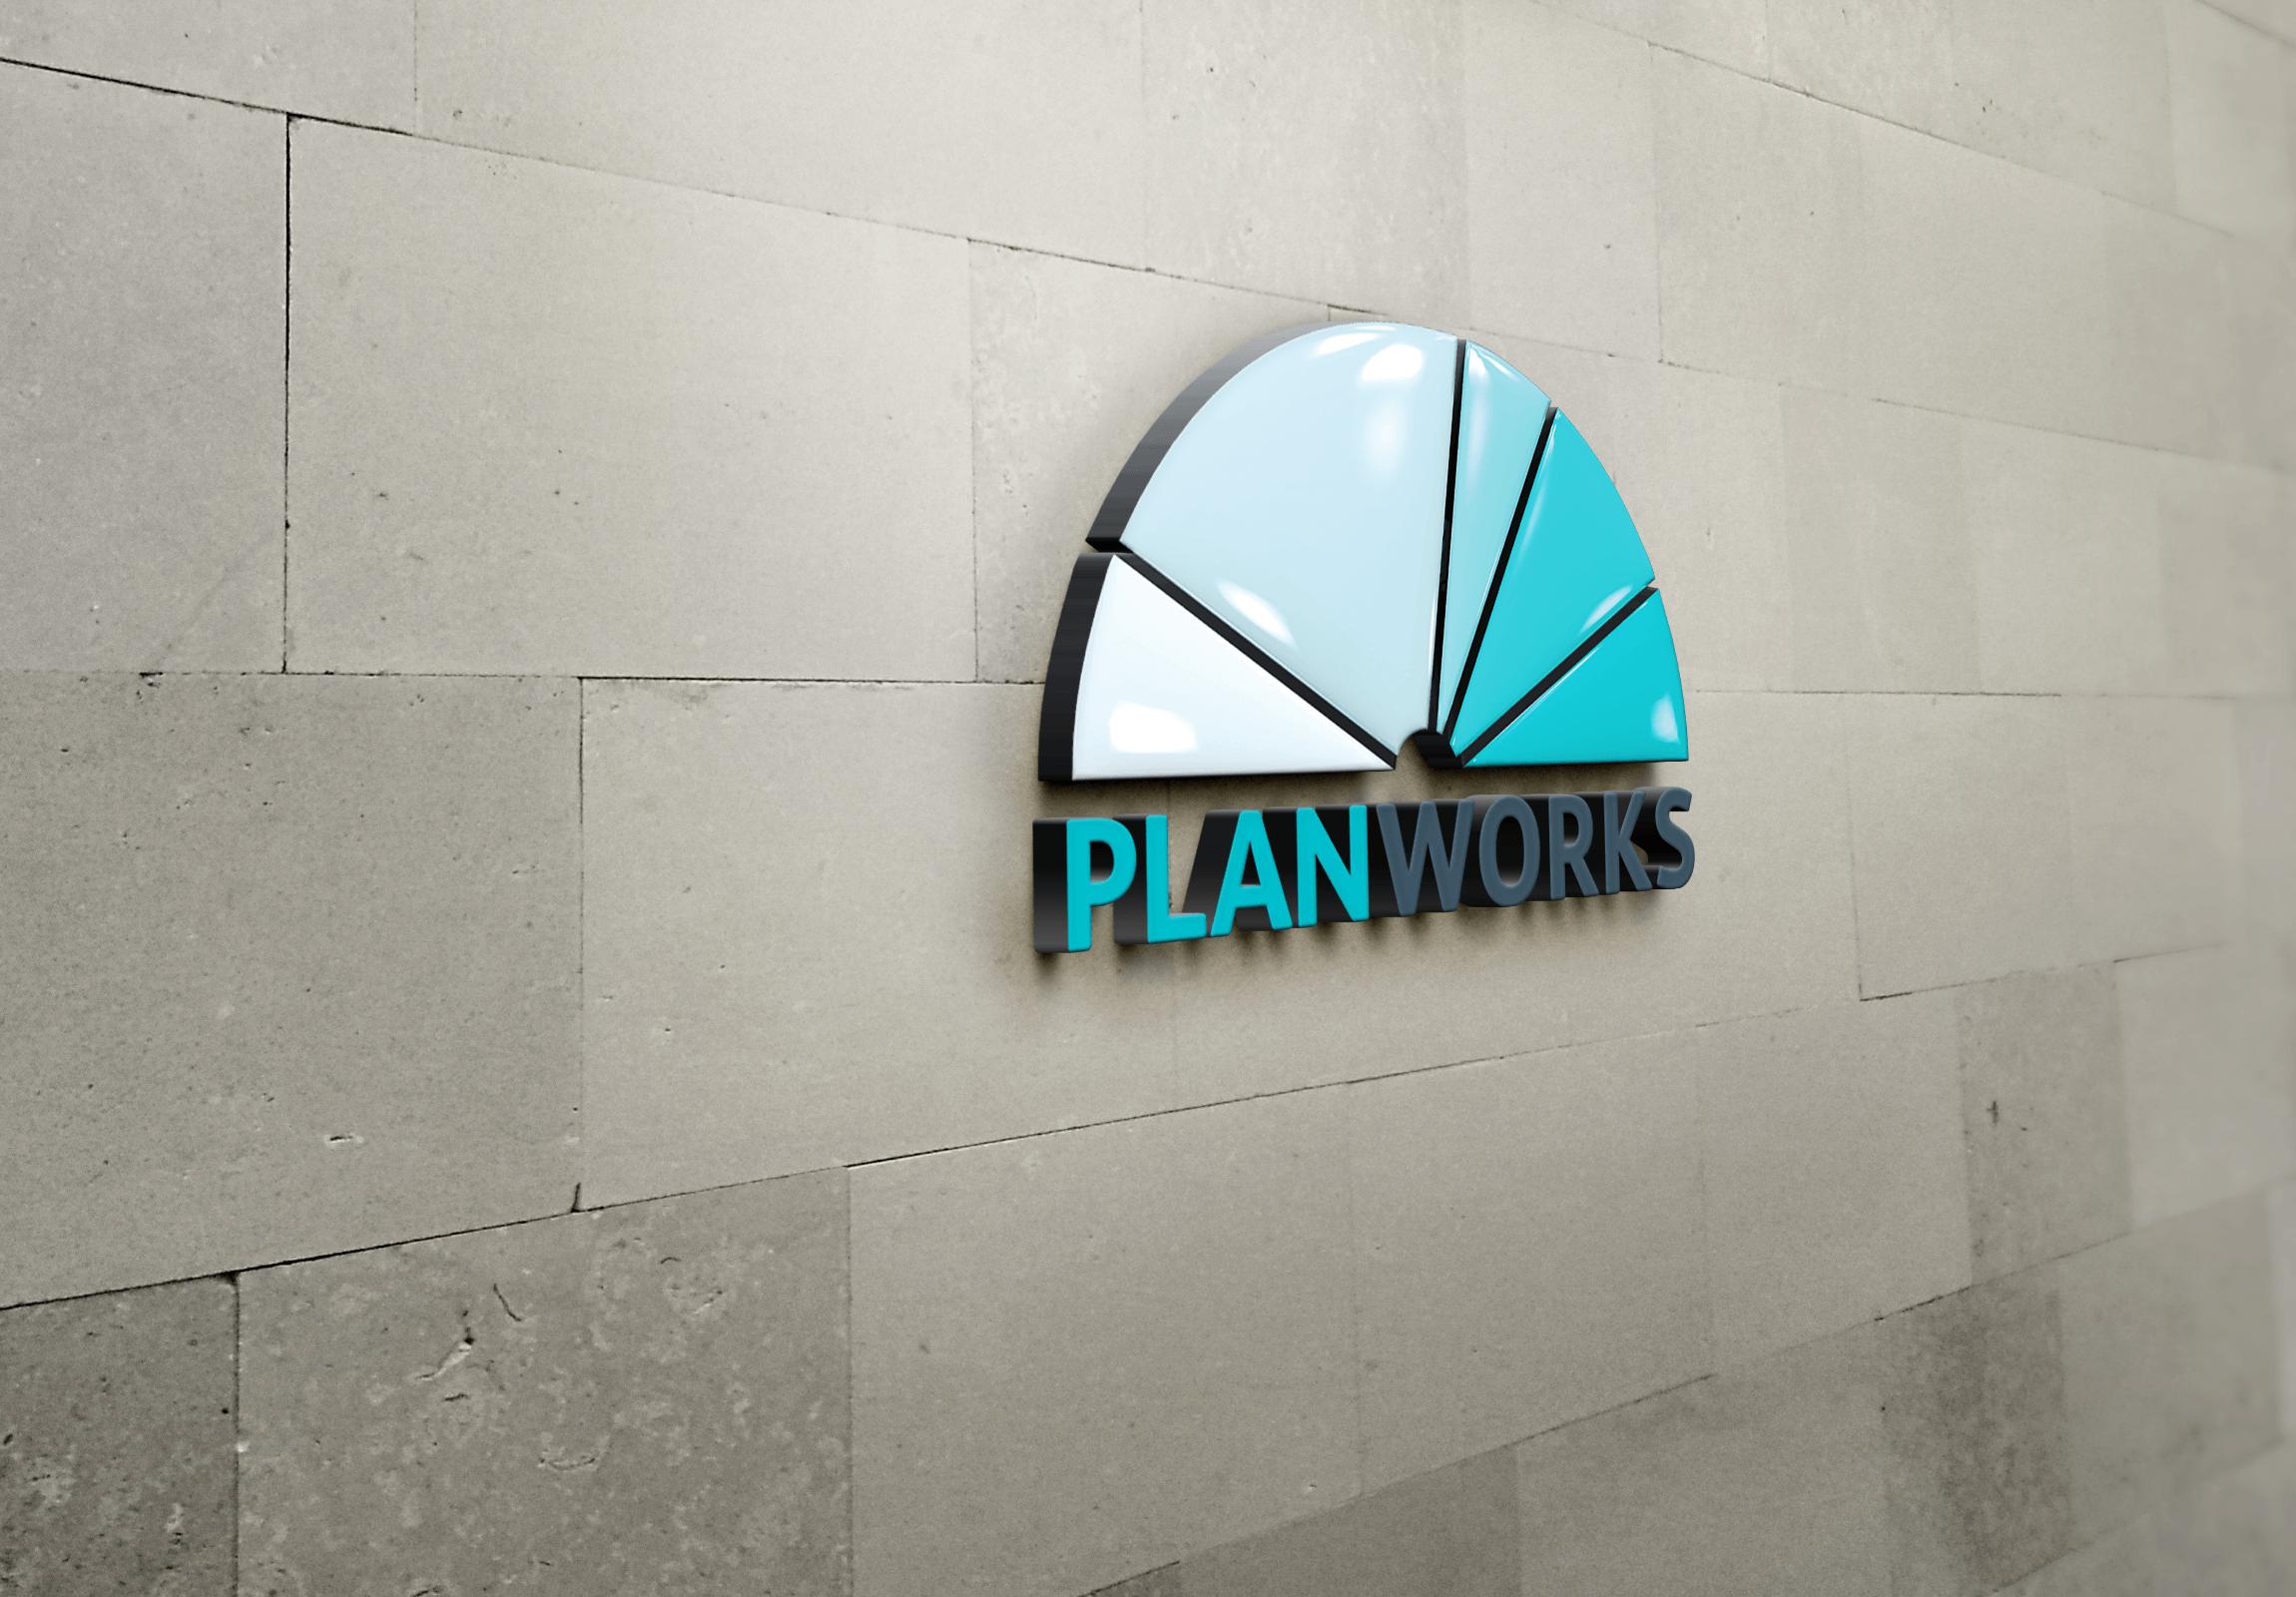 Planworks